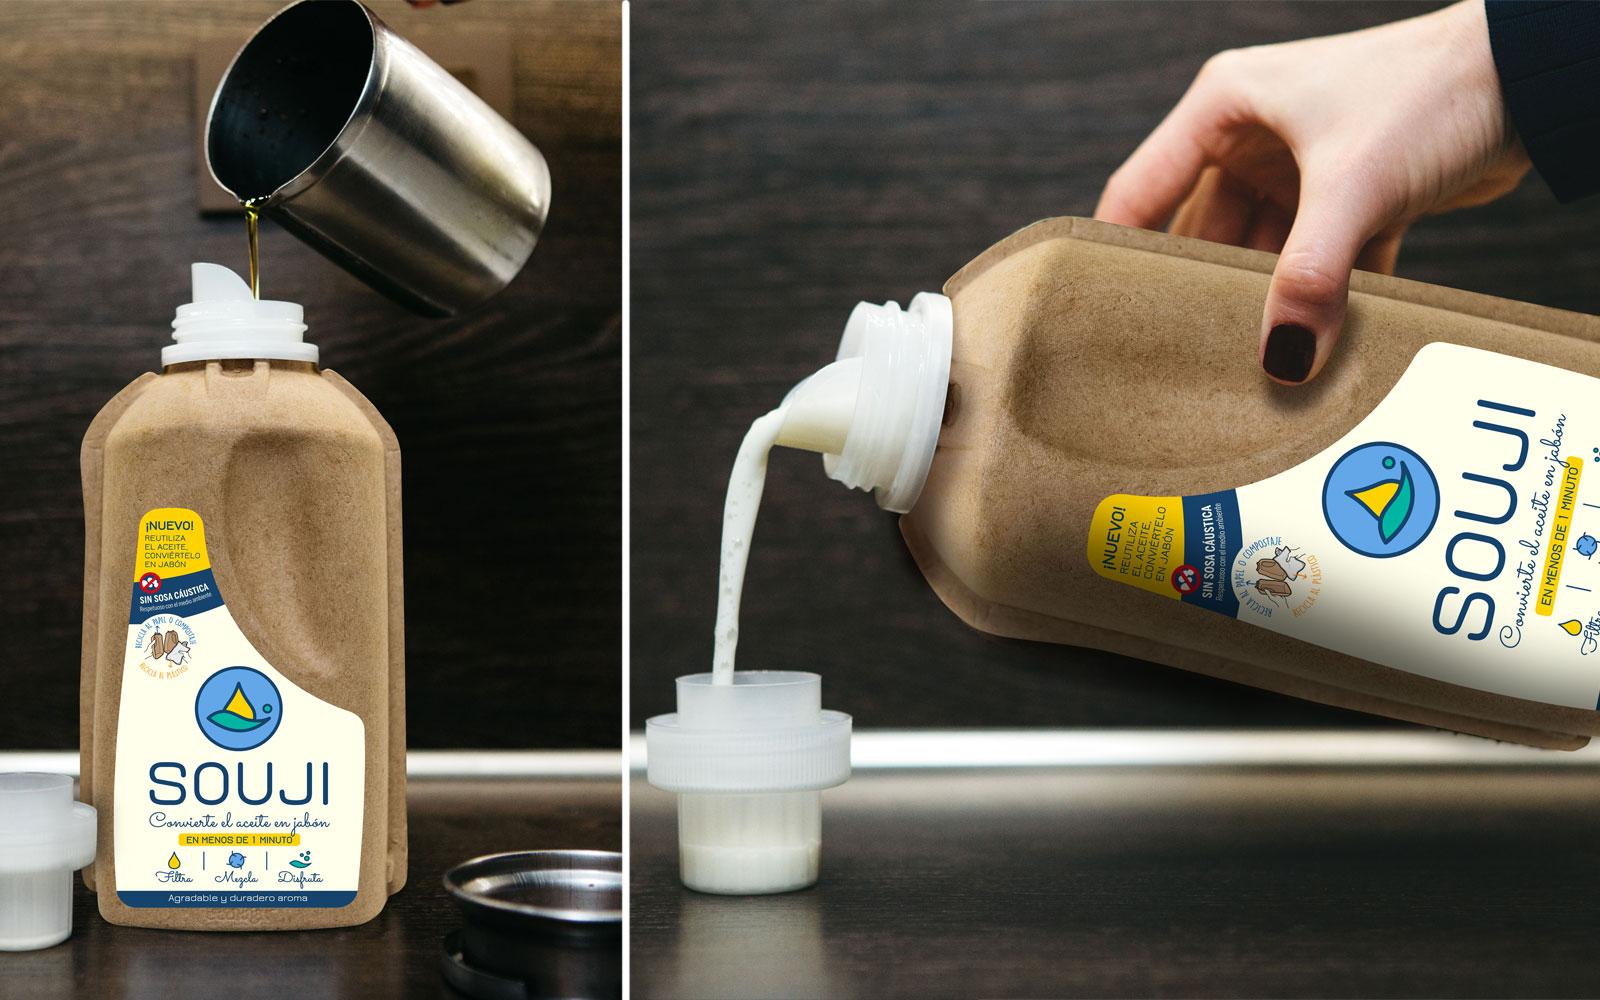 Souji botella reciclaje aceite fabricar jabon